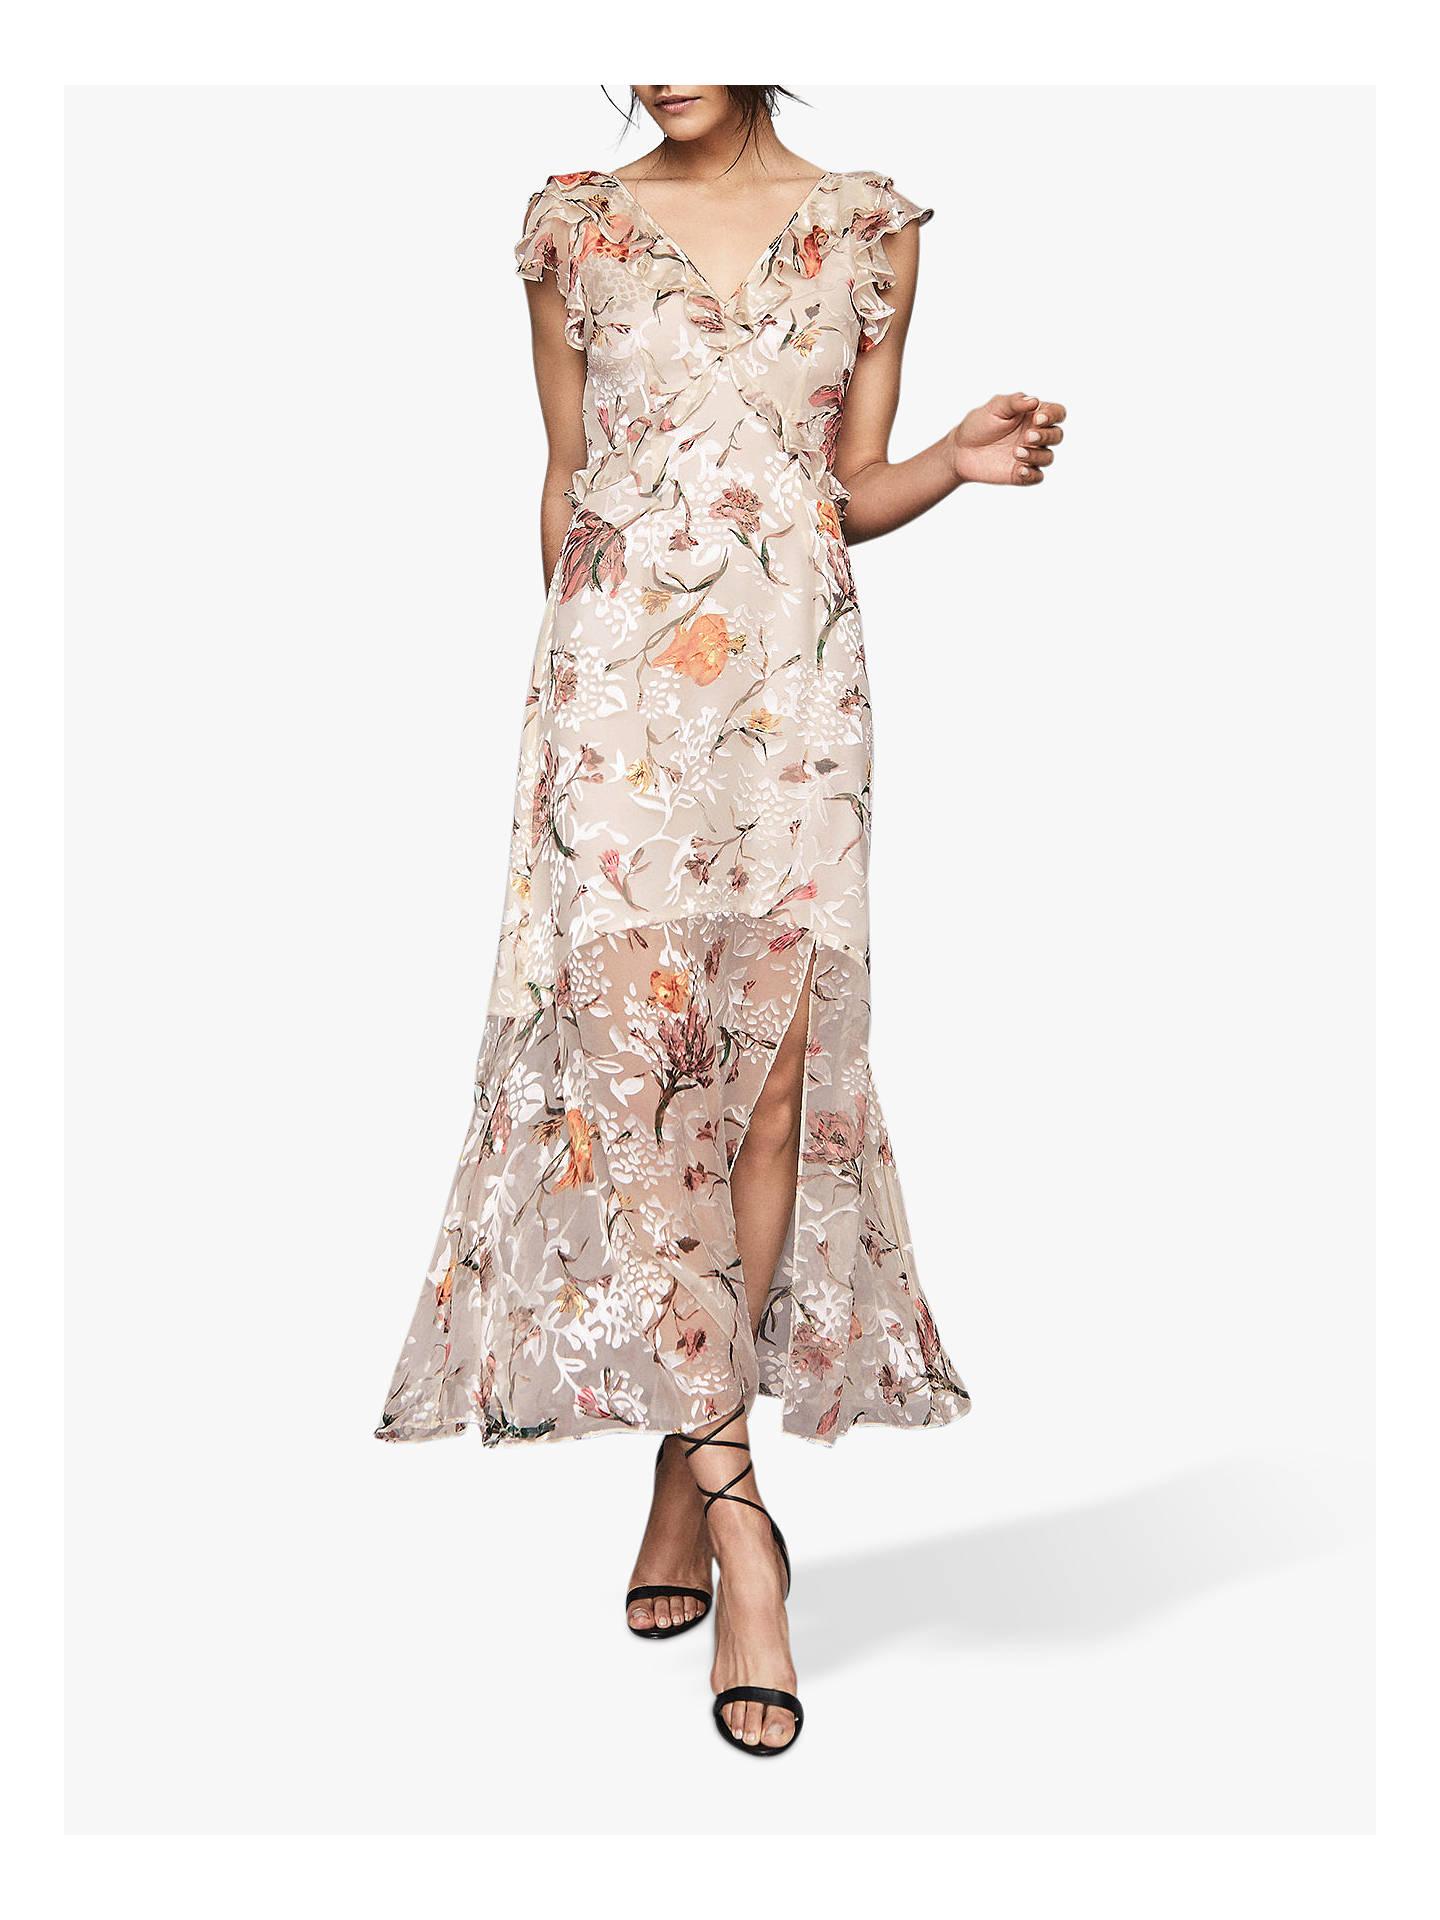 794e5116a7 Reiss Leila Burnout Maxi Dress, Blush/Multi